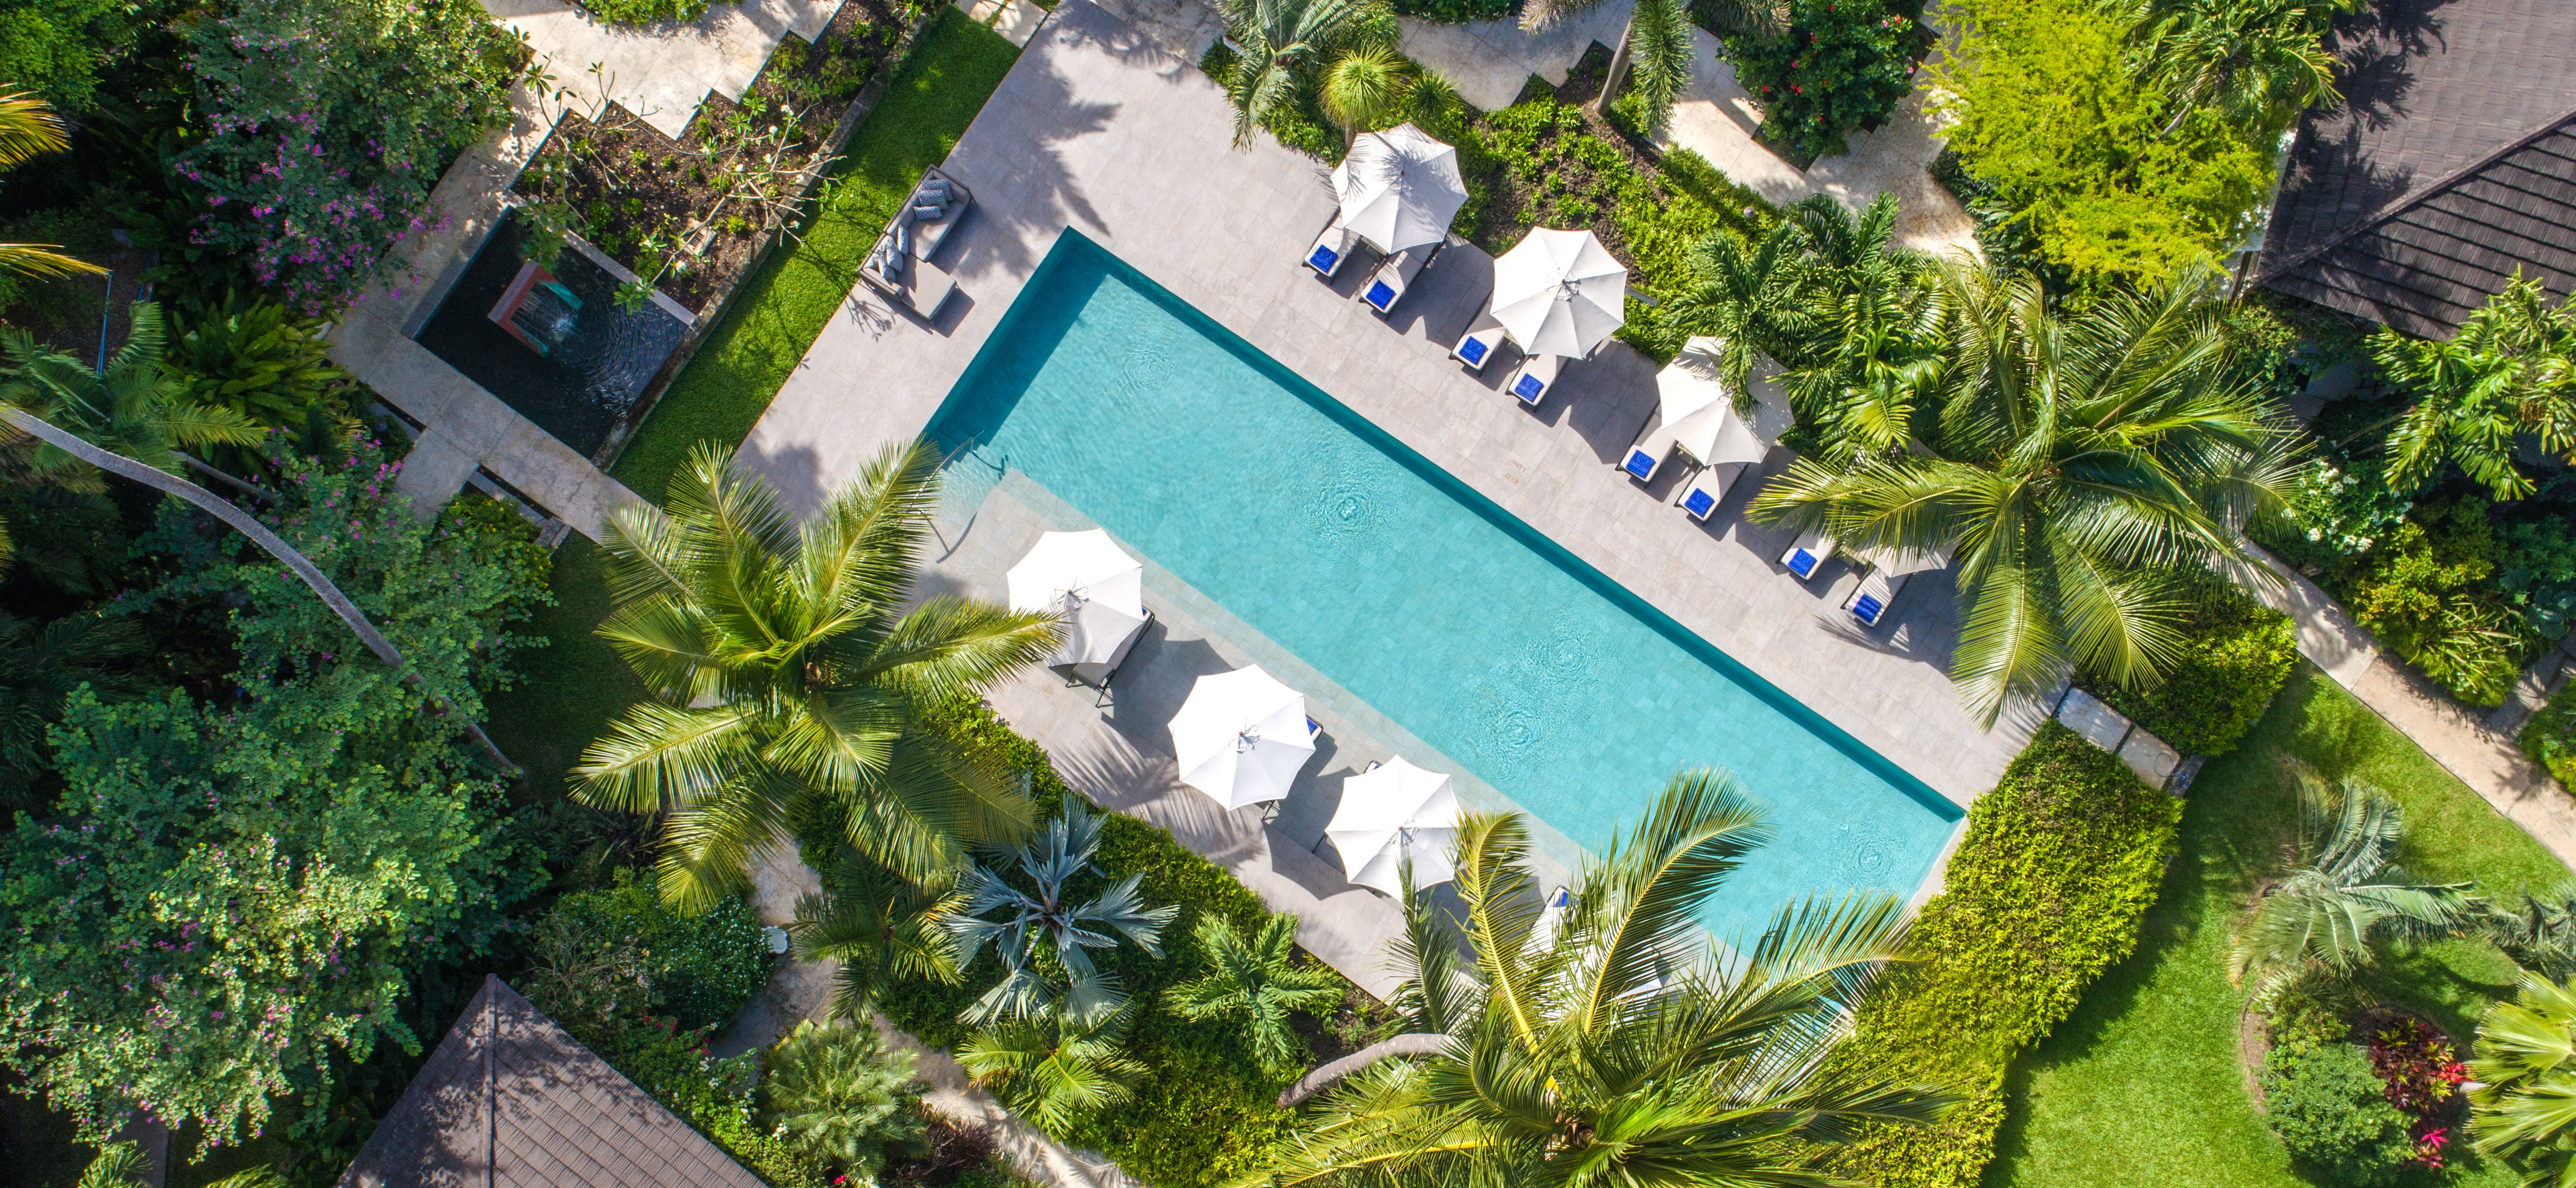 the-sandpiper-hotel-barbados-pool